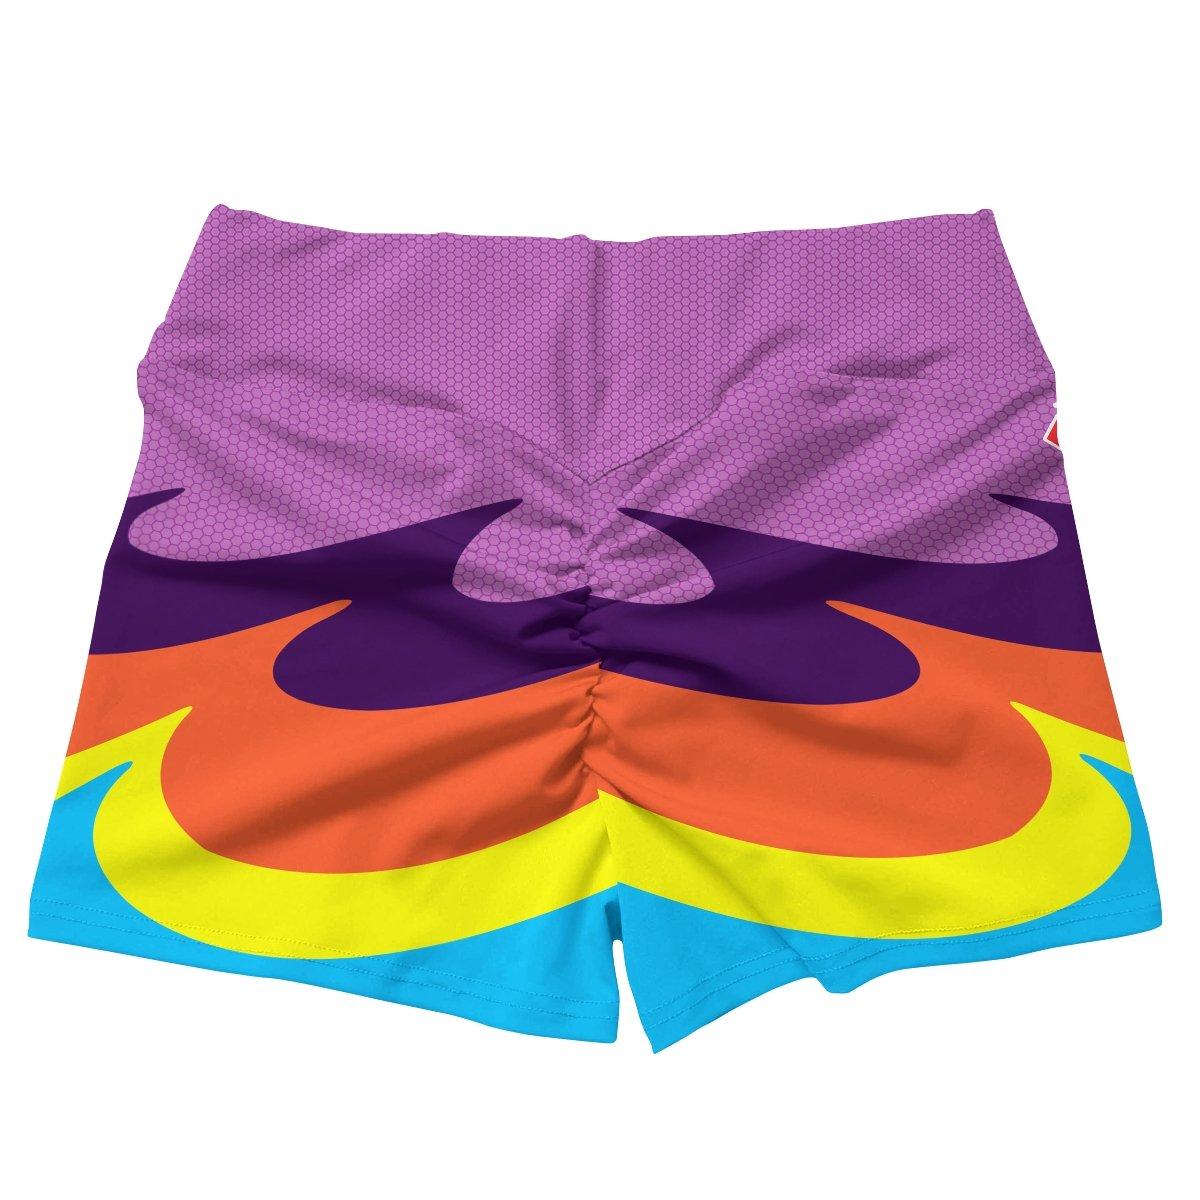 pokemon psychic uniform active wear set 798308 - Anime Swimsuits